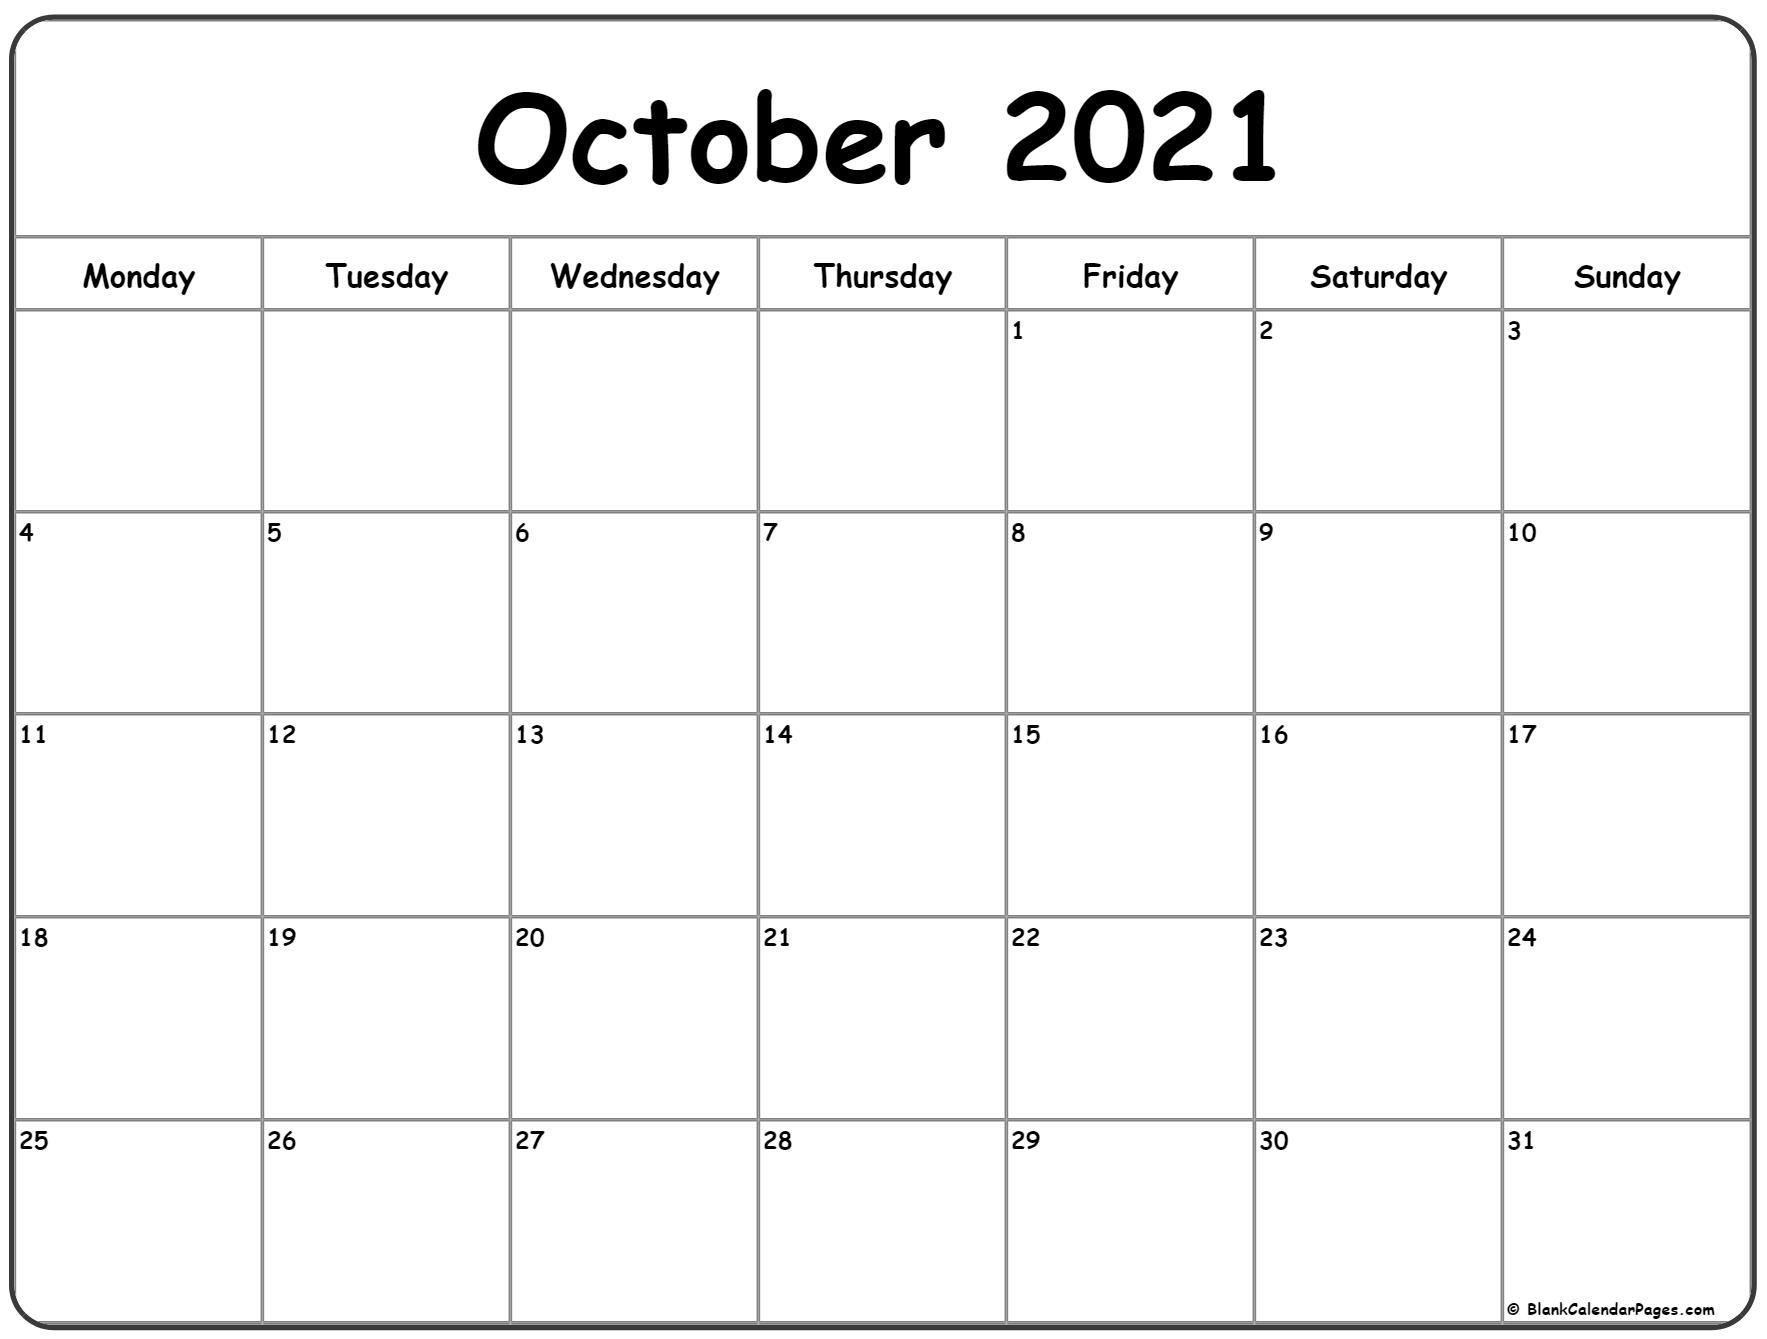 October Calendar 2021 | Month Calendar Printable throughout Calendar 2021 October Fill In